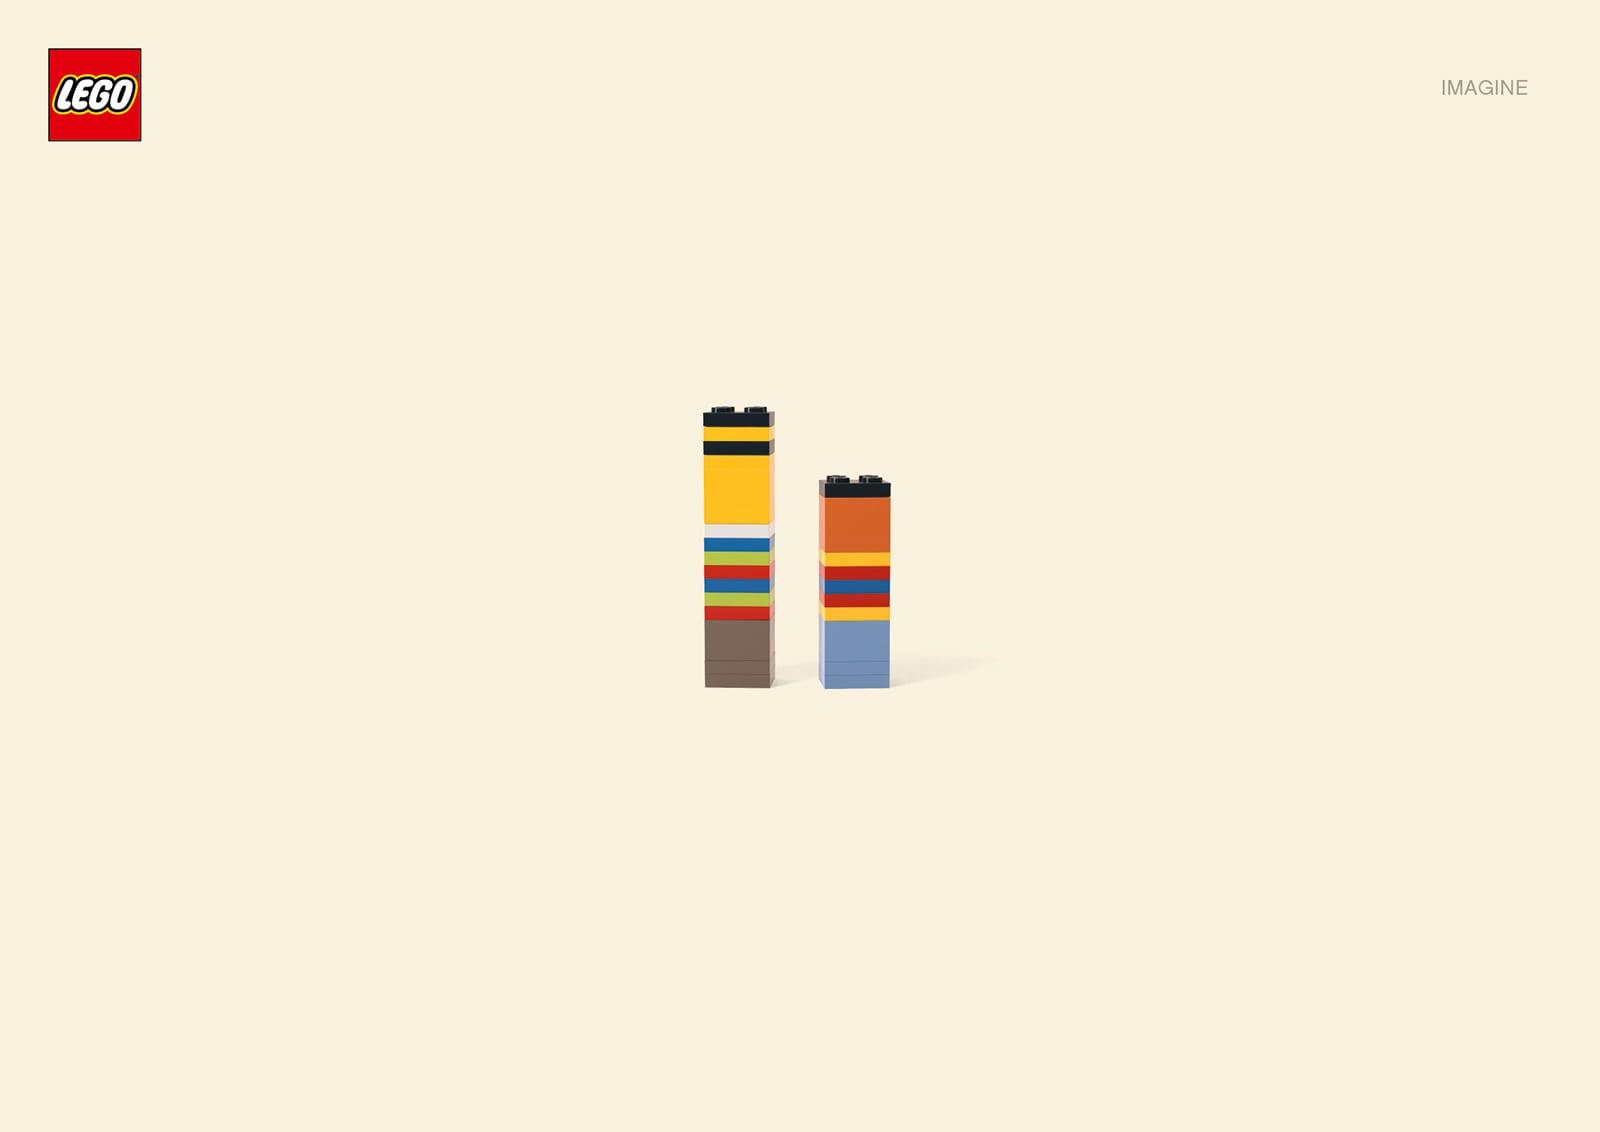 lego minimalista (4)